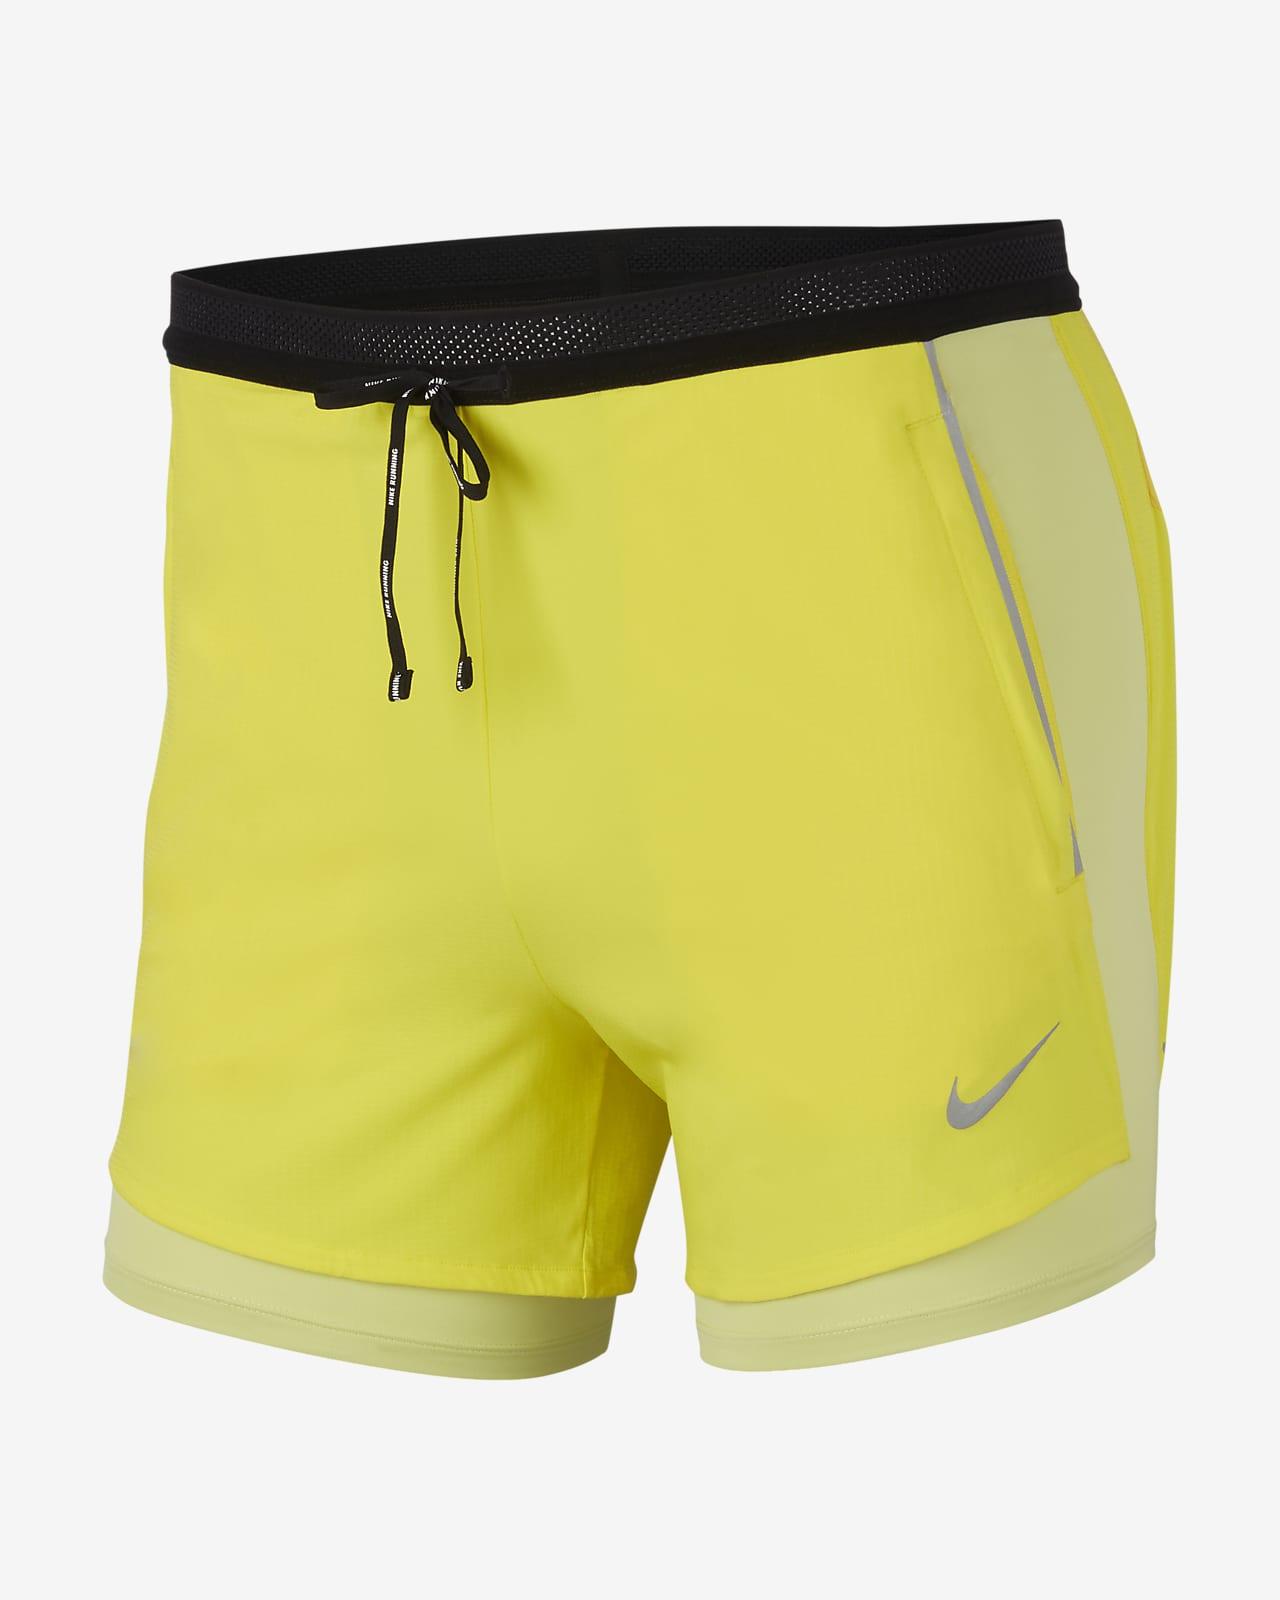 Nike Flex Swift Men's 2-In-1 Running Shorts